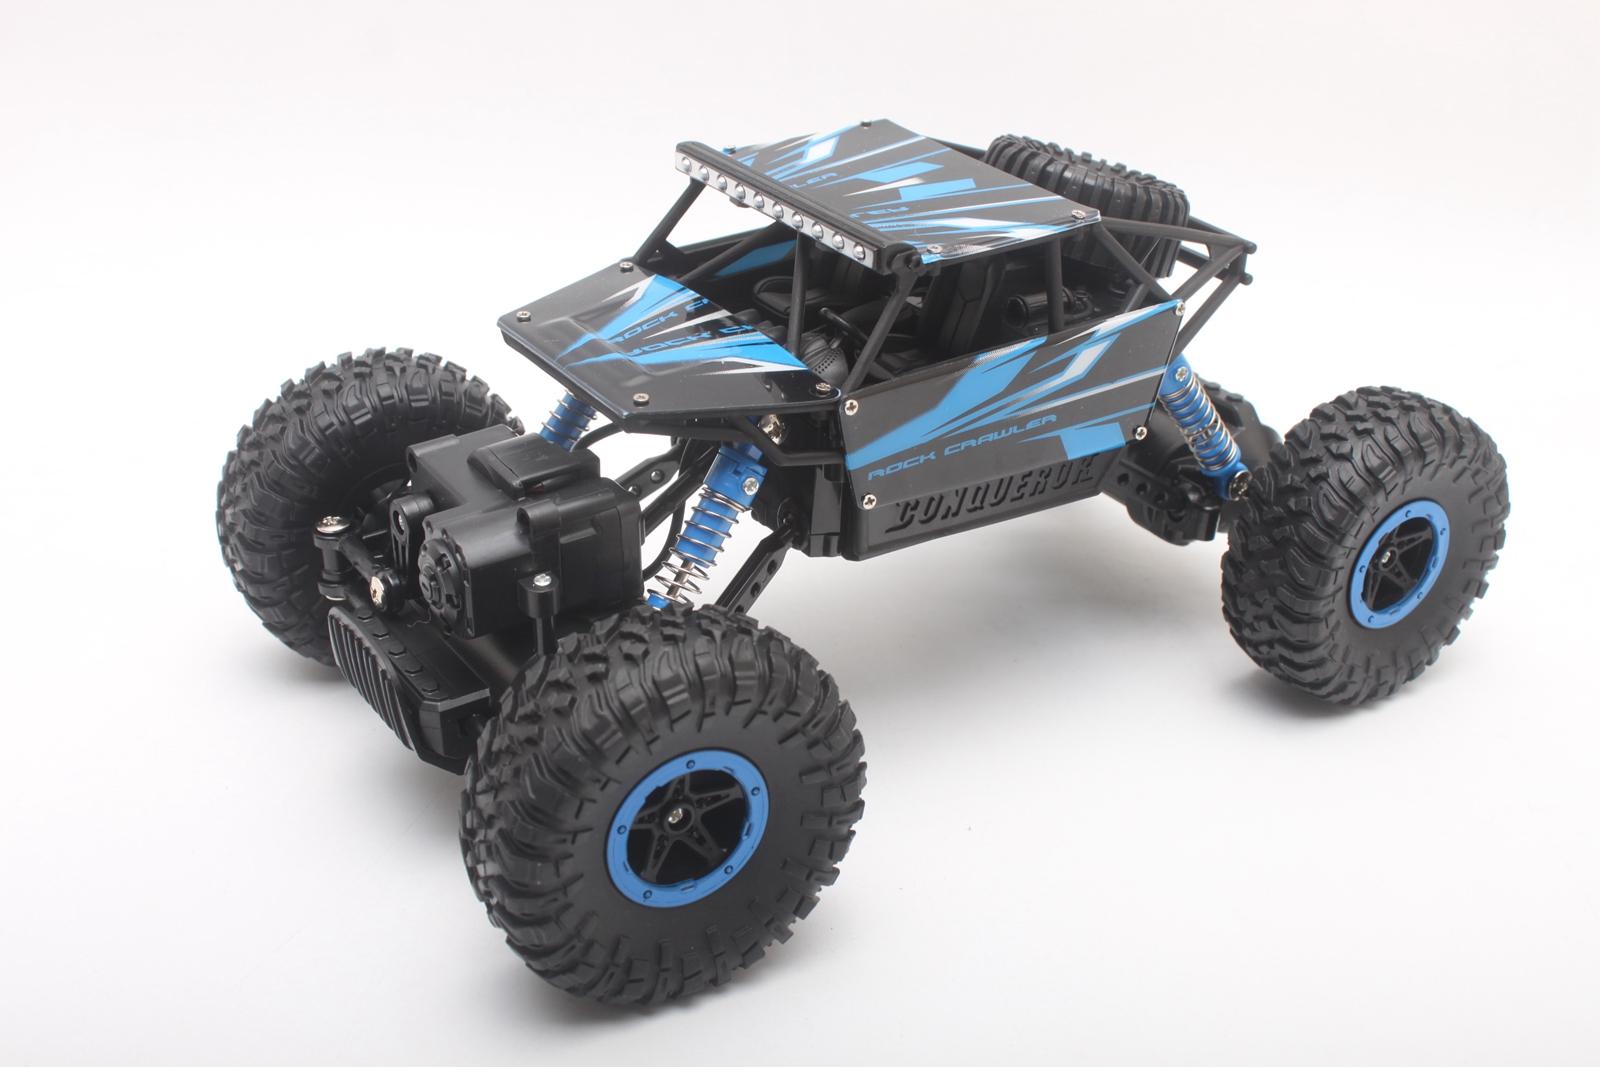 HB-P1801 4x4 Rock Crawler Off-Road Buggy Vehicle